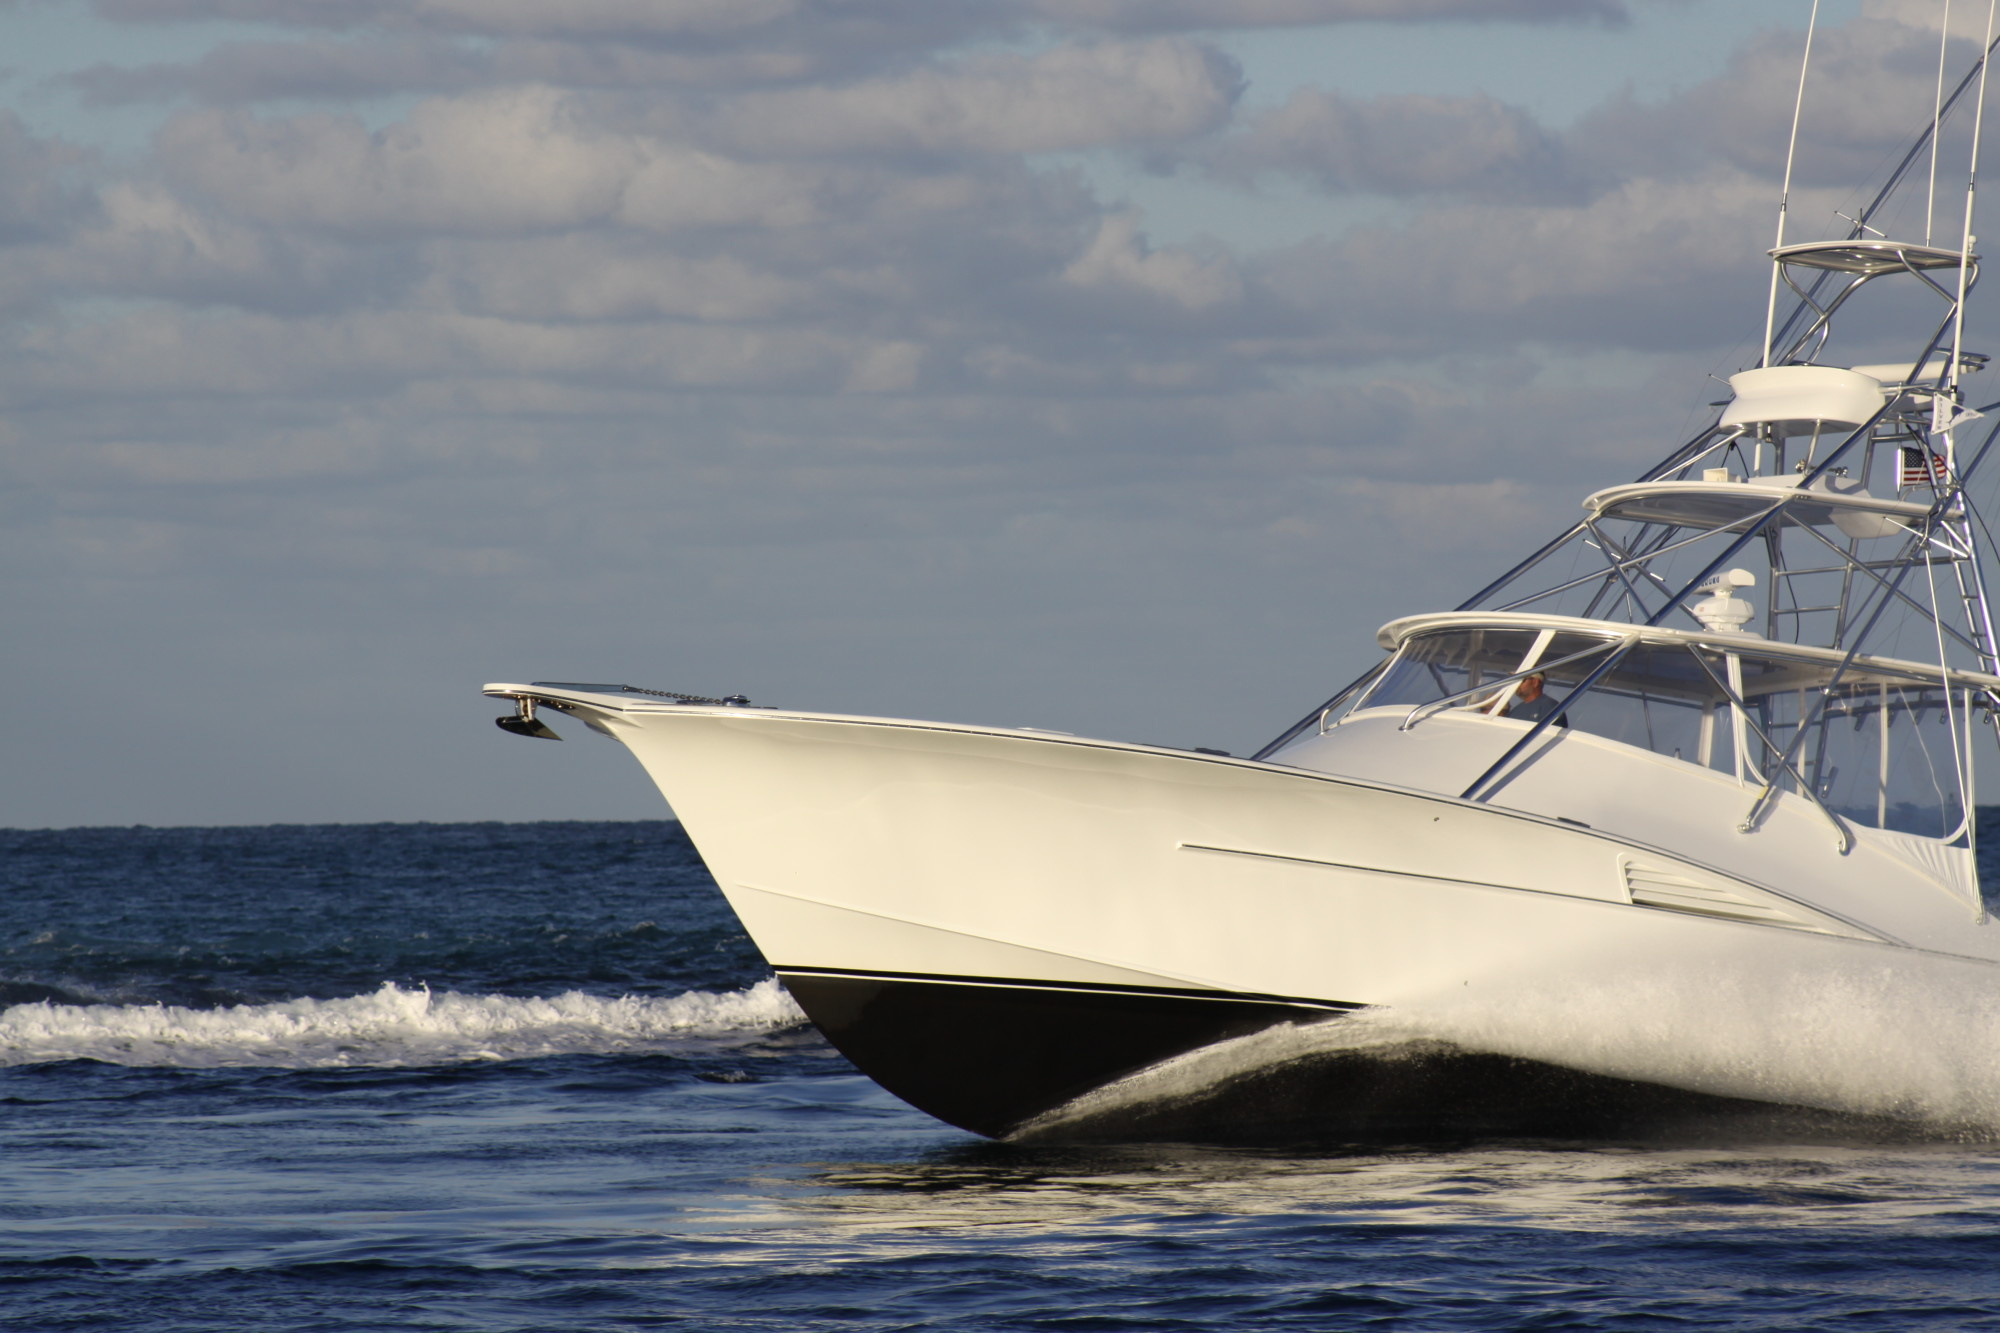 3 Reasons Why Marine Sandblasting Is Ideal for Boat Restoration